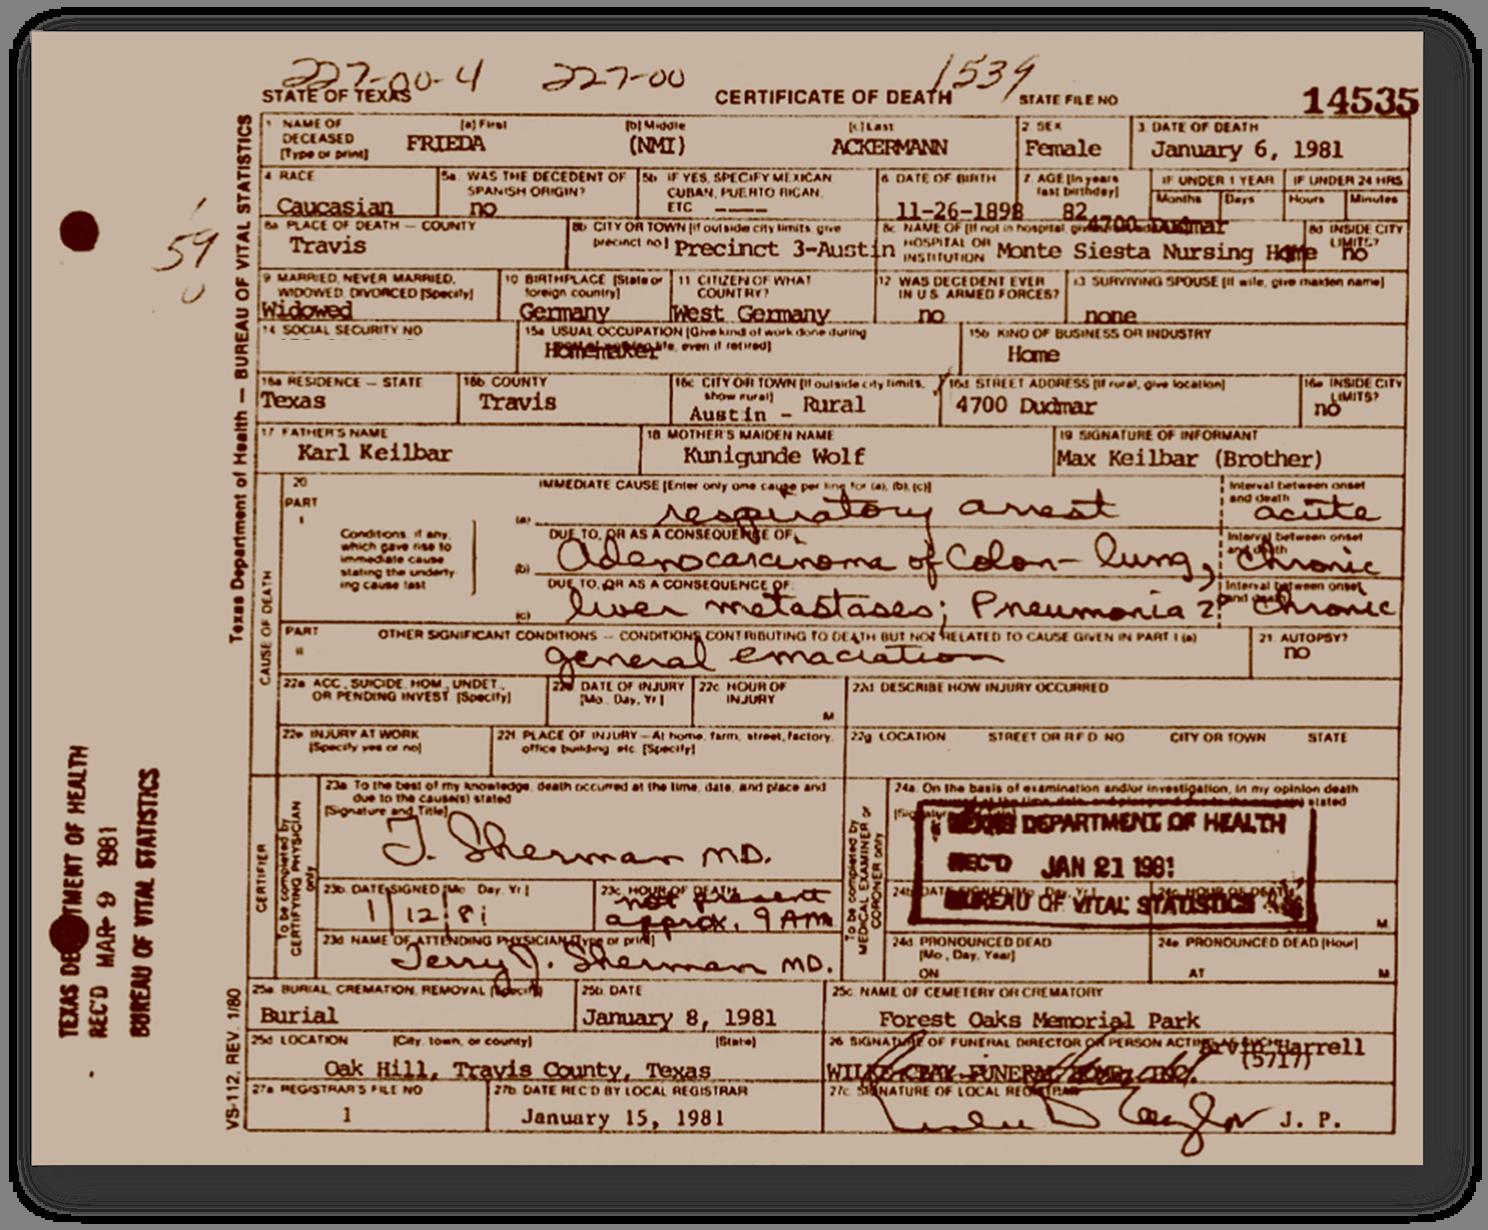 Texas Death Certificate - Frieda Ackermann